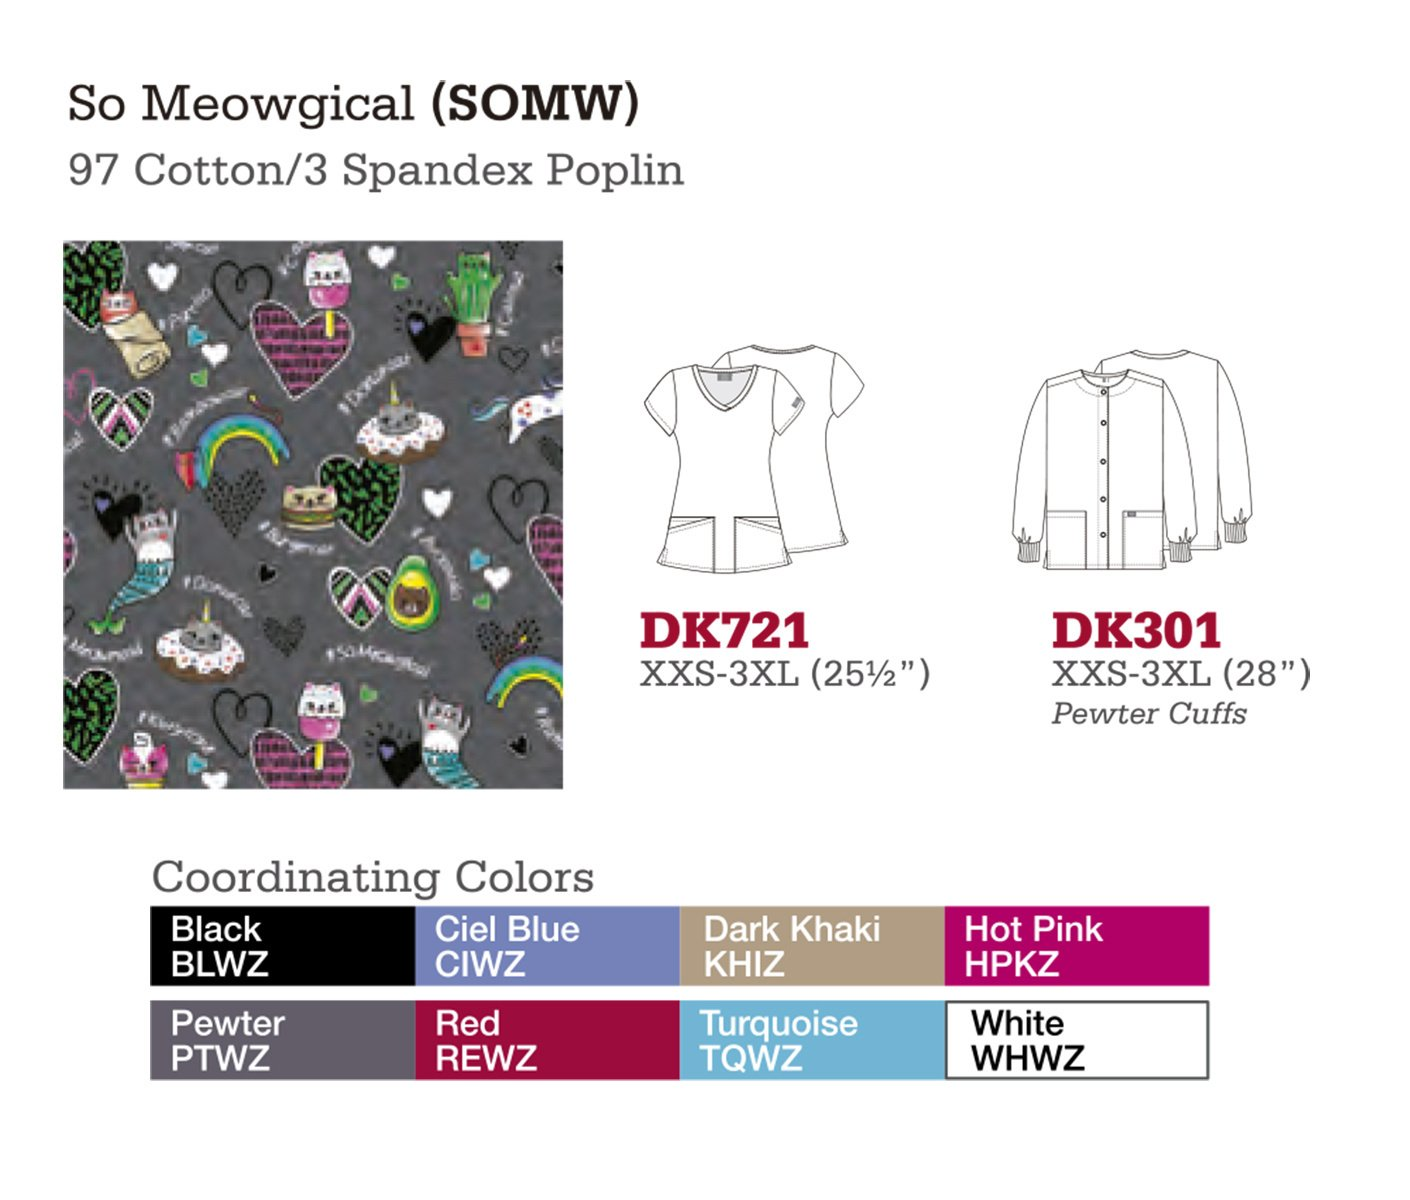 So Meowgical. DK721. DK301.